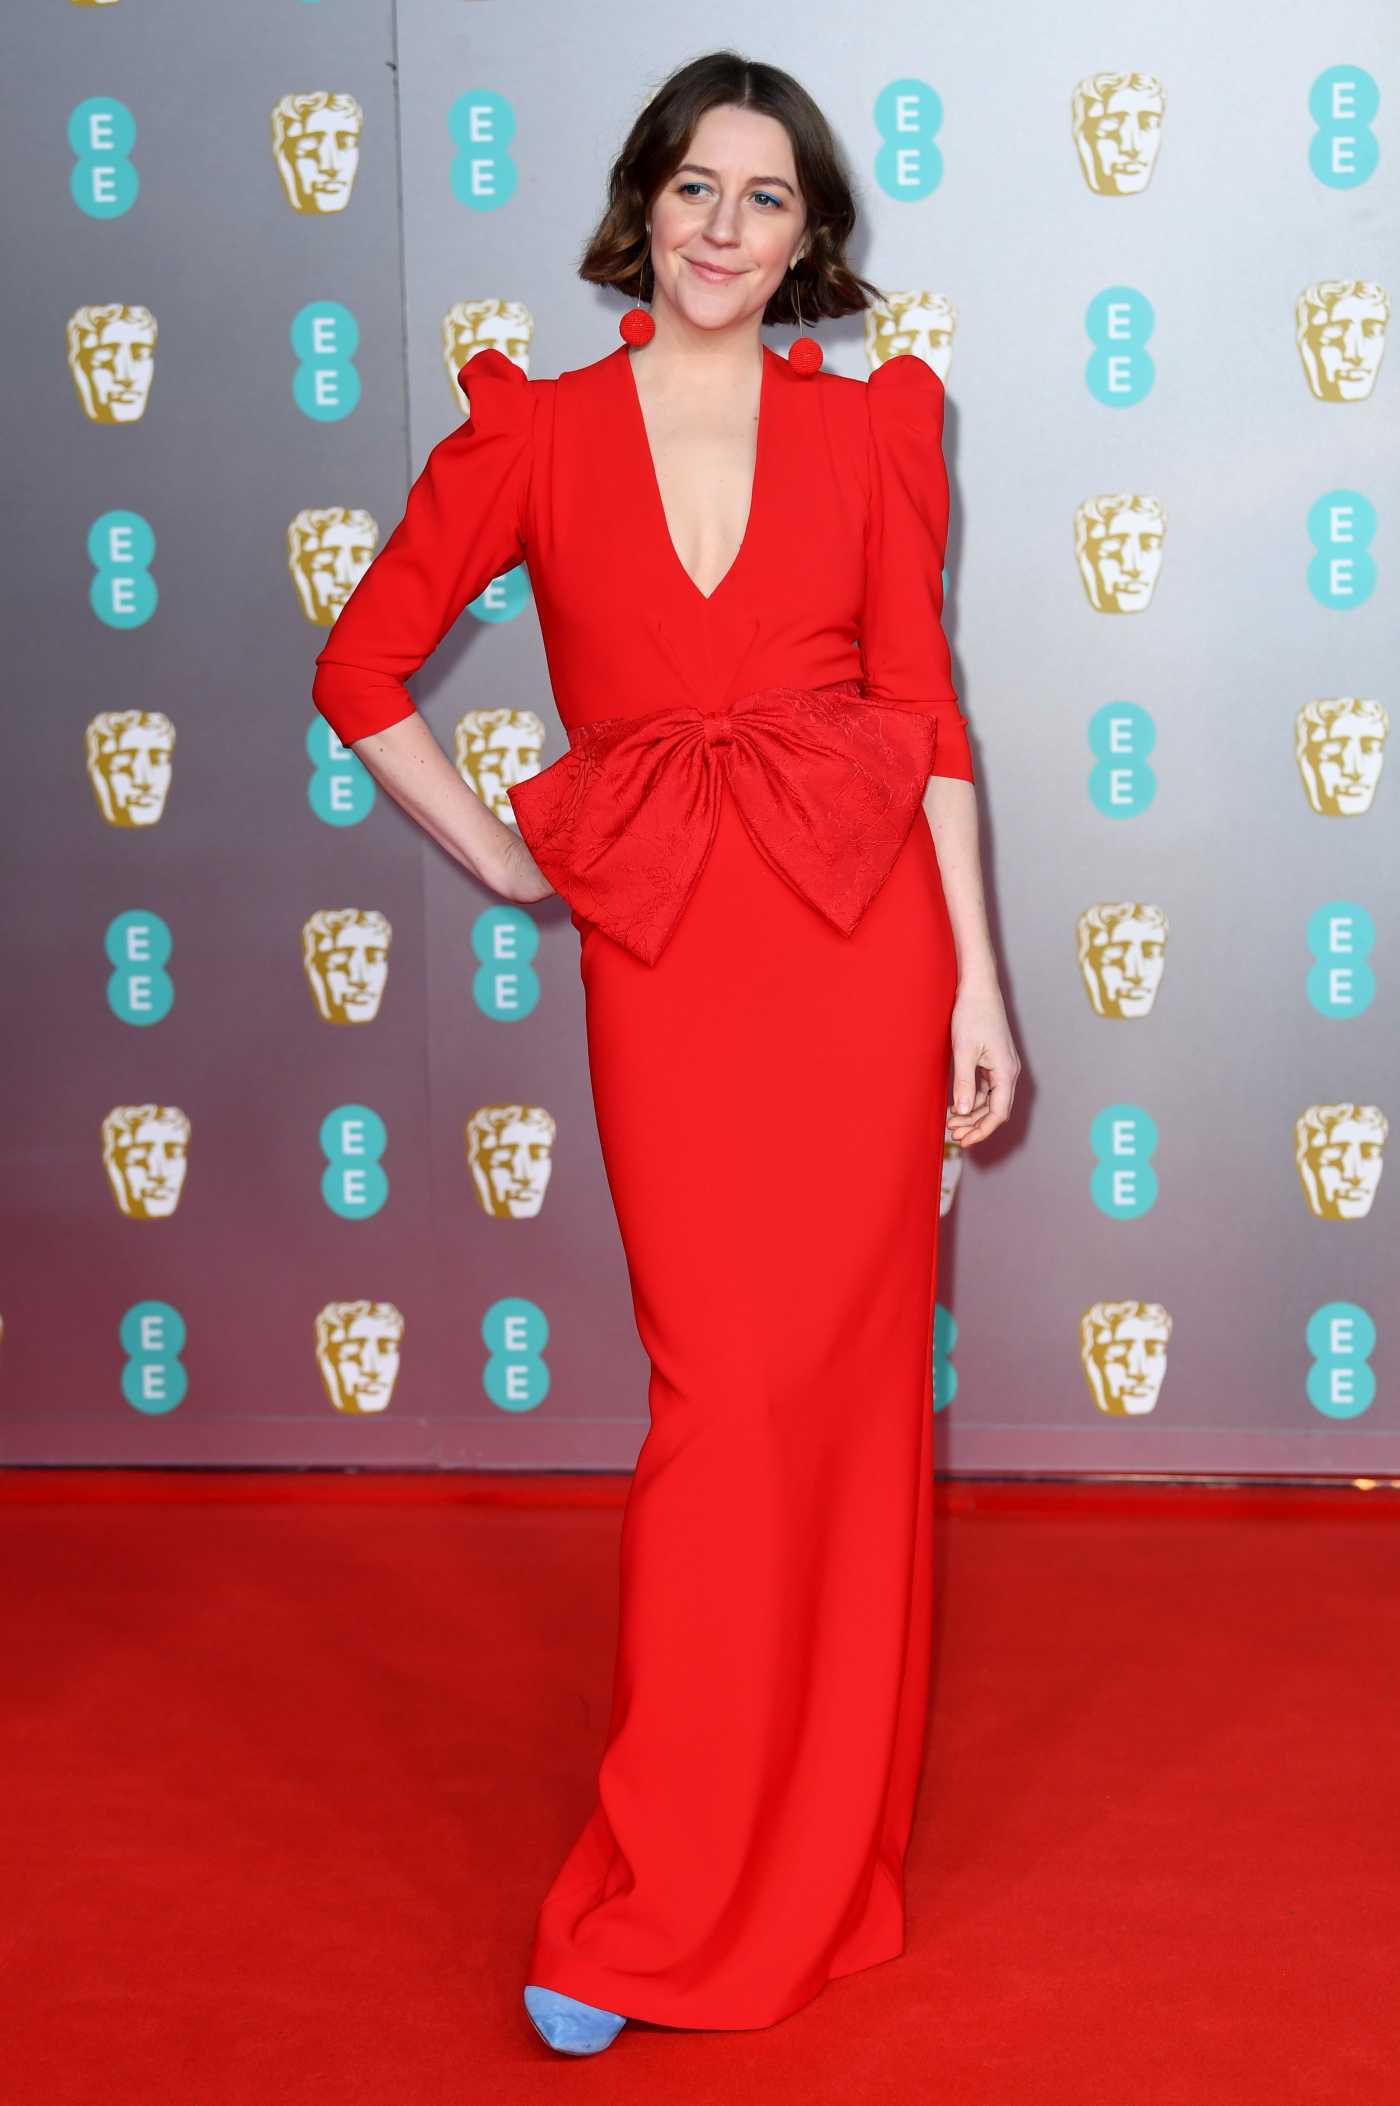 Gemma Whelan Attends 2020 EE British Academy Film Awards Nominees Party in London 02/02/2020